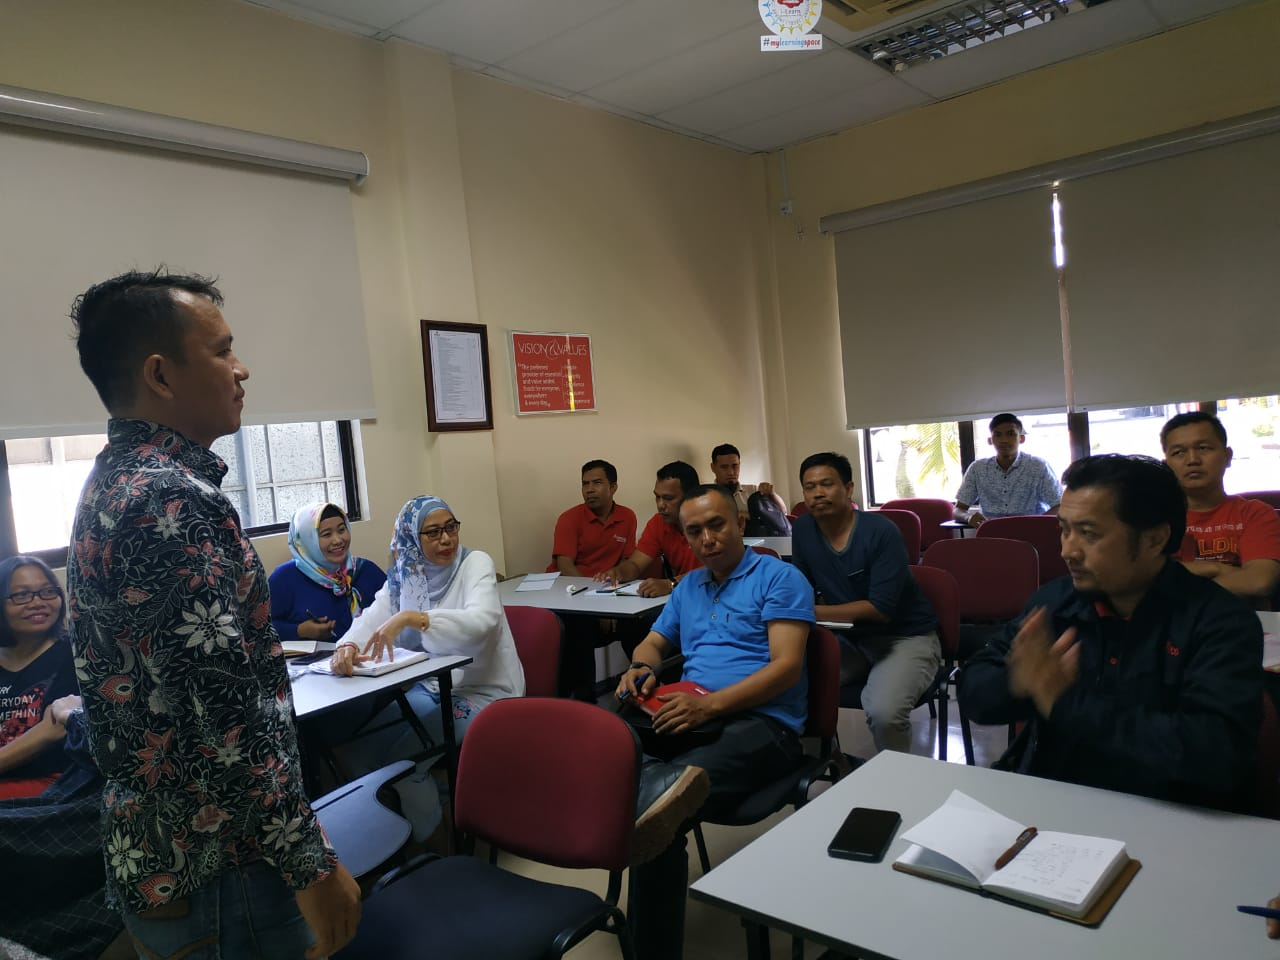 kursus bahasa inggris batam